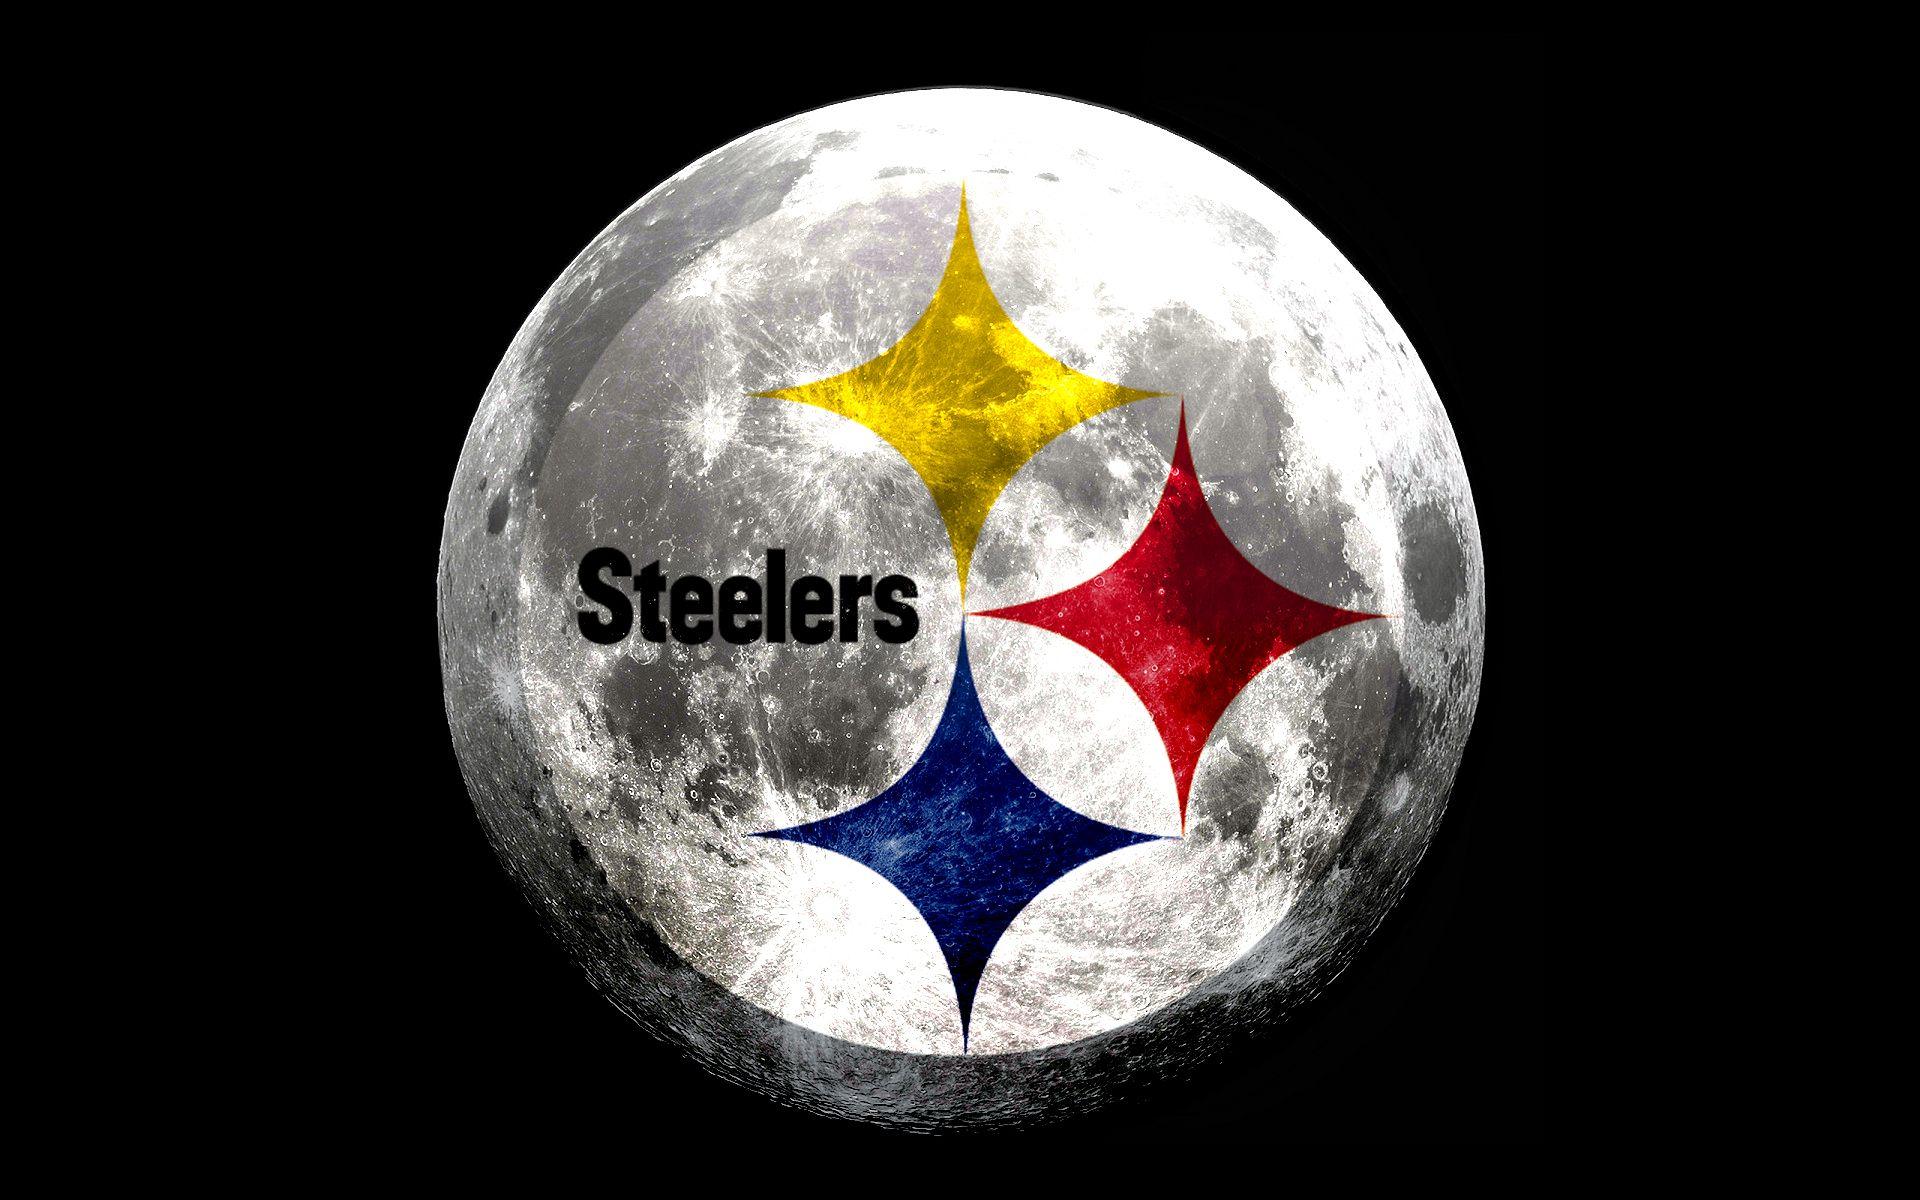 Pittsburgh Steelers Printable Logo More Steelers Wallpapers Loaded Up Pittsburgh Steelers Wallpaper Pittsburgh Steelers Pittsburgh Steelers Logo